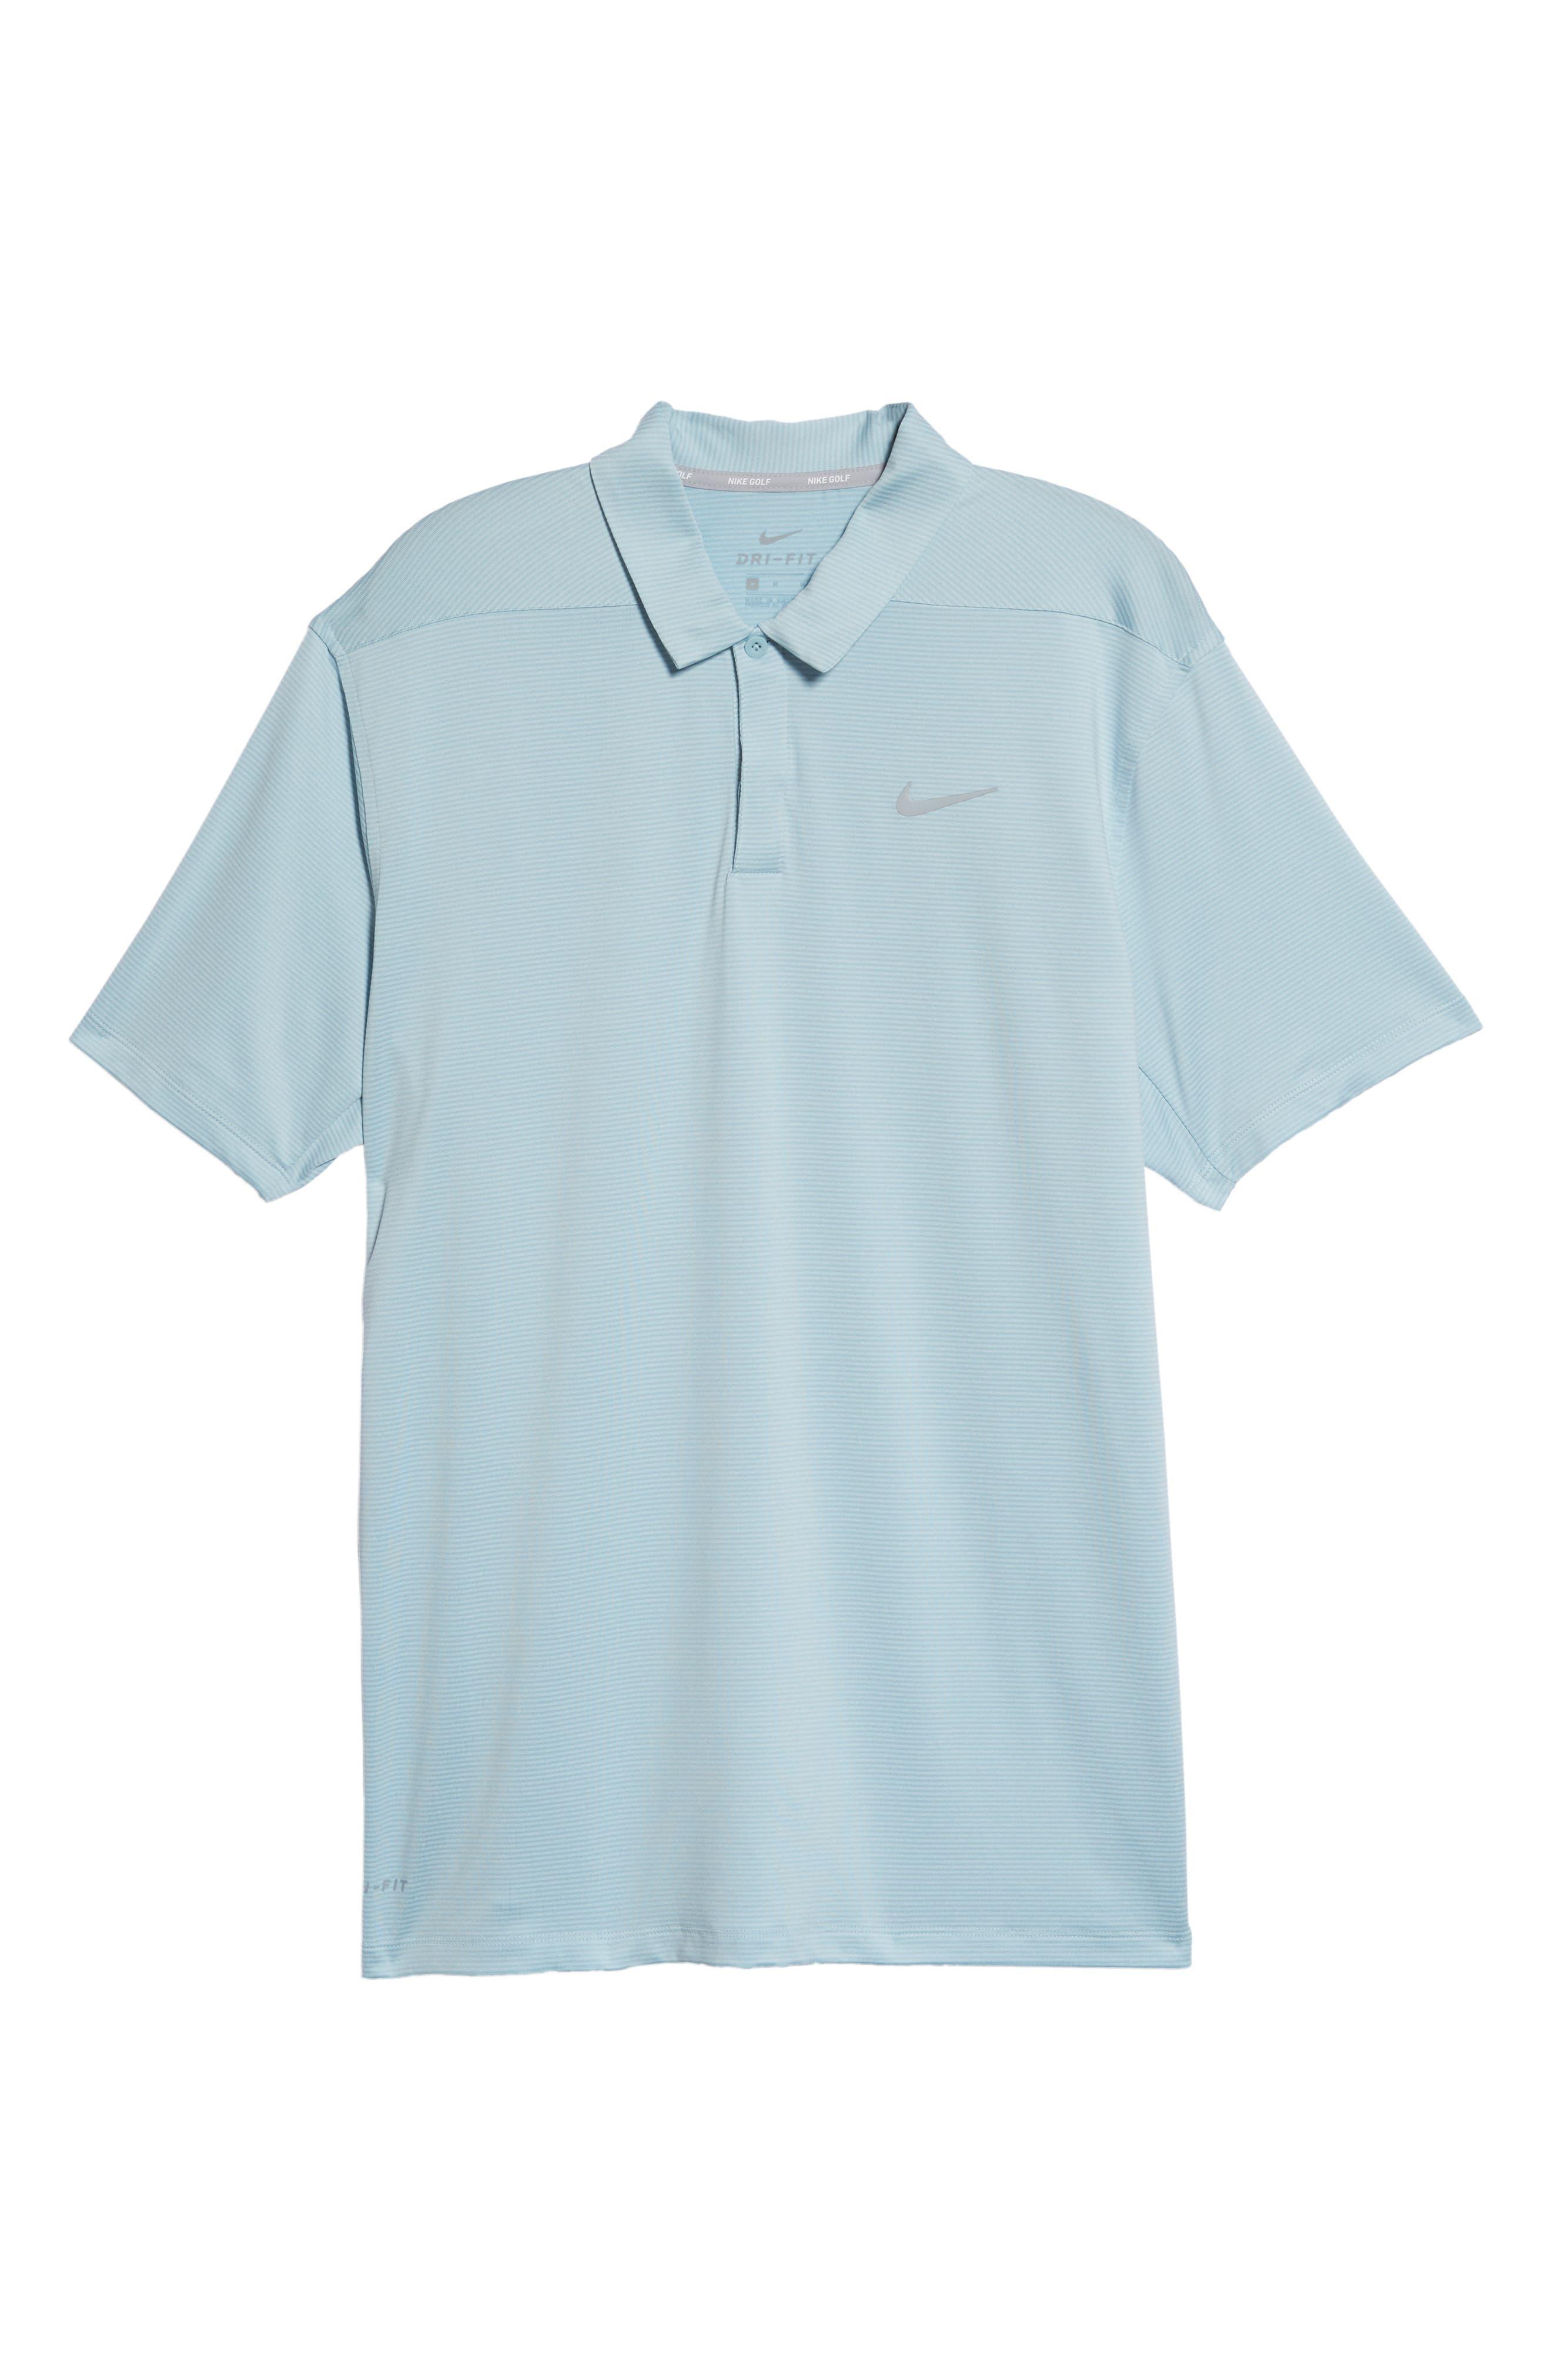 Dry Polo Shirt,                             Alternate thumbnail 6, color,                             OCEAN BLISS/ SILVER